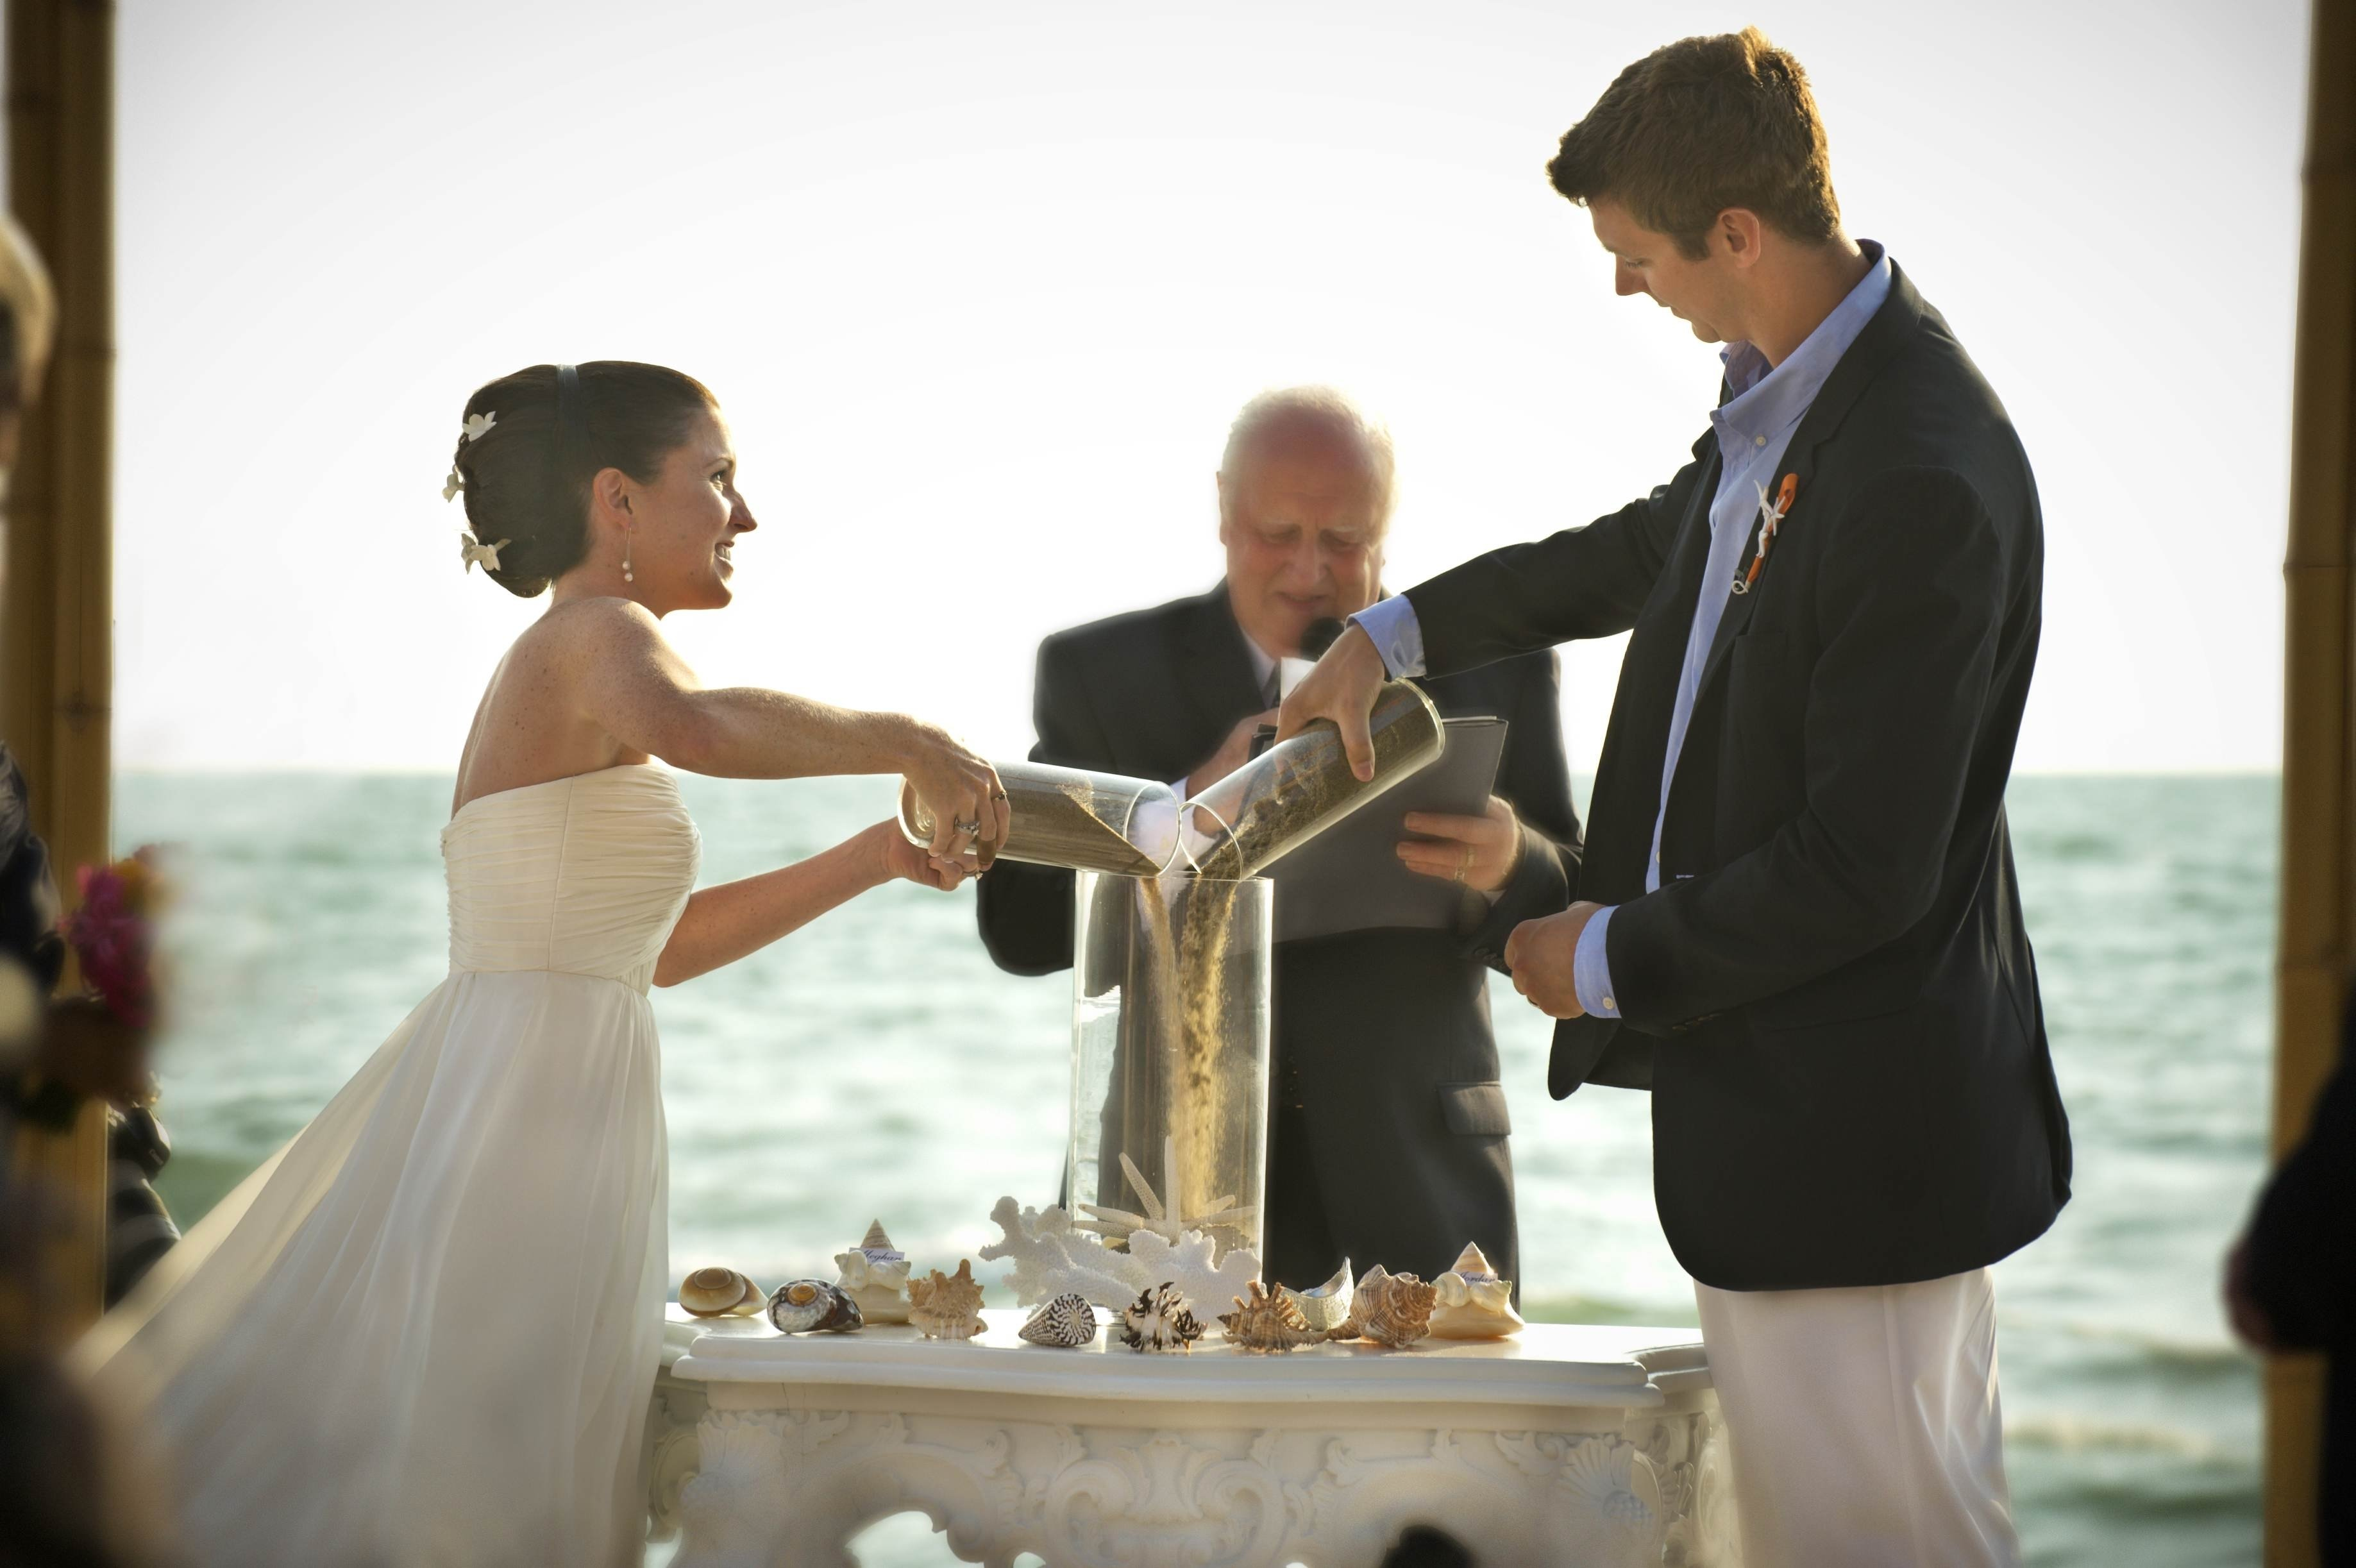 10 Beautiful Unity Ideas For Wedding Ceremony wedding ceremony ideas unity ceremonies for nuptials inside weddings